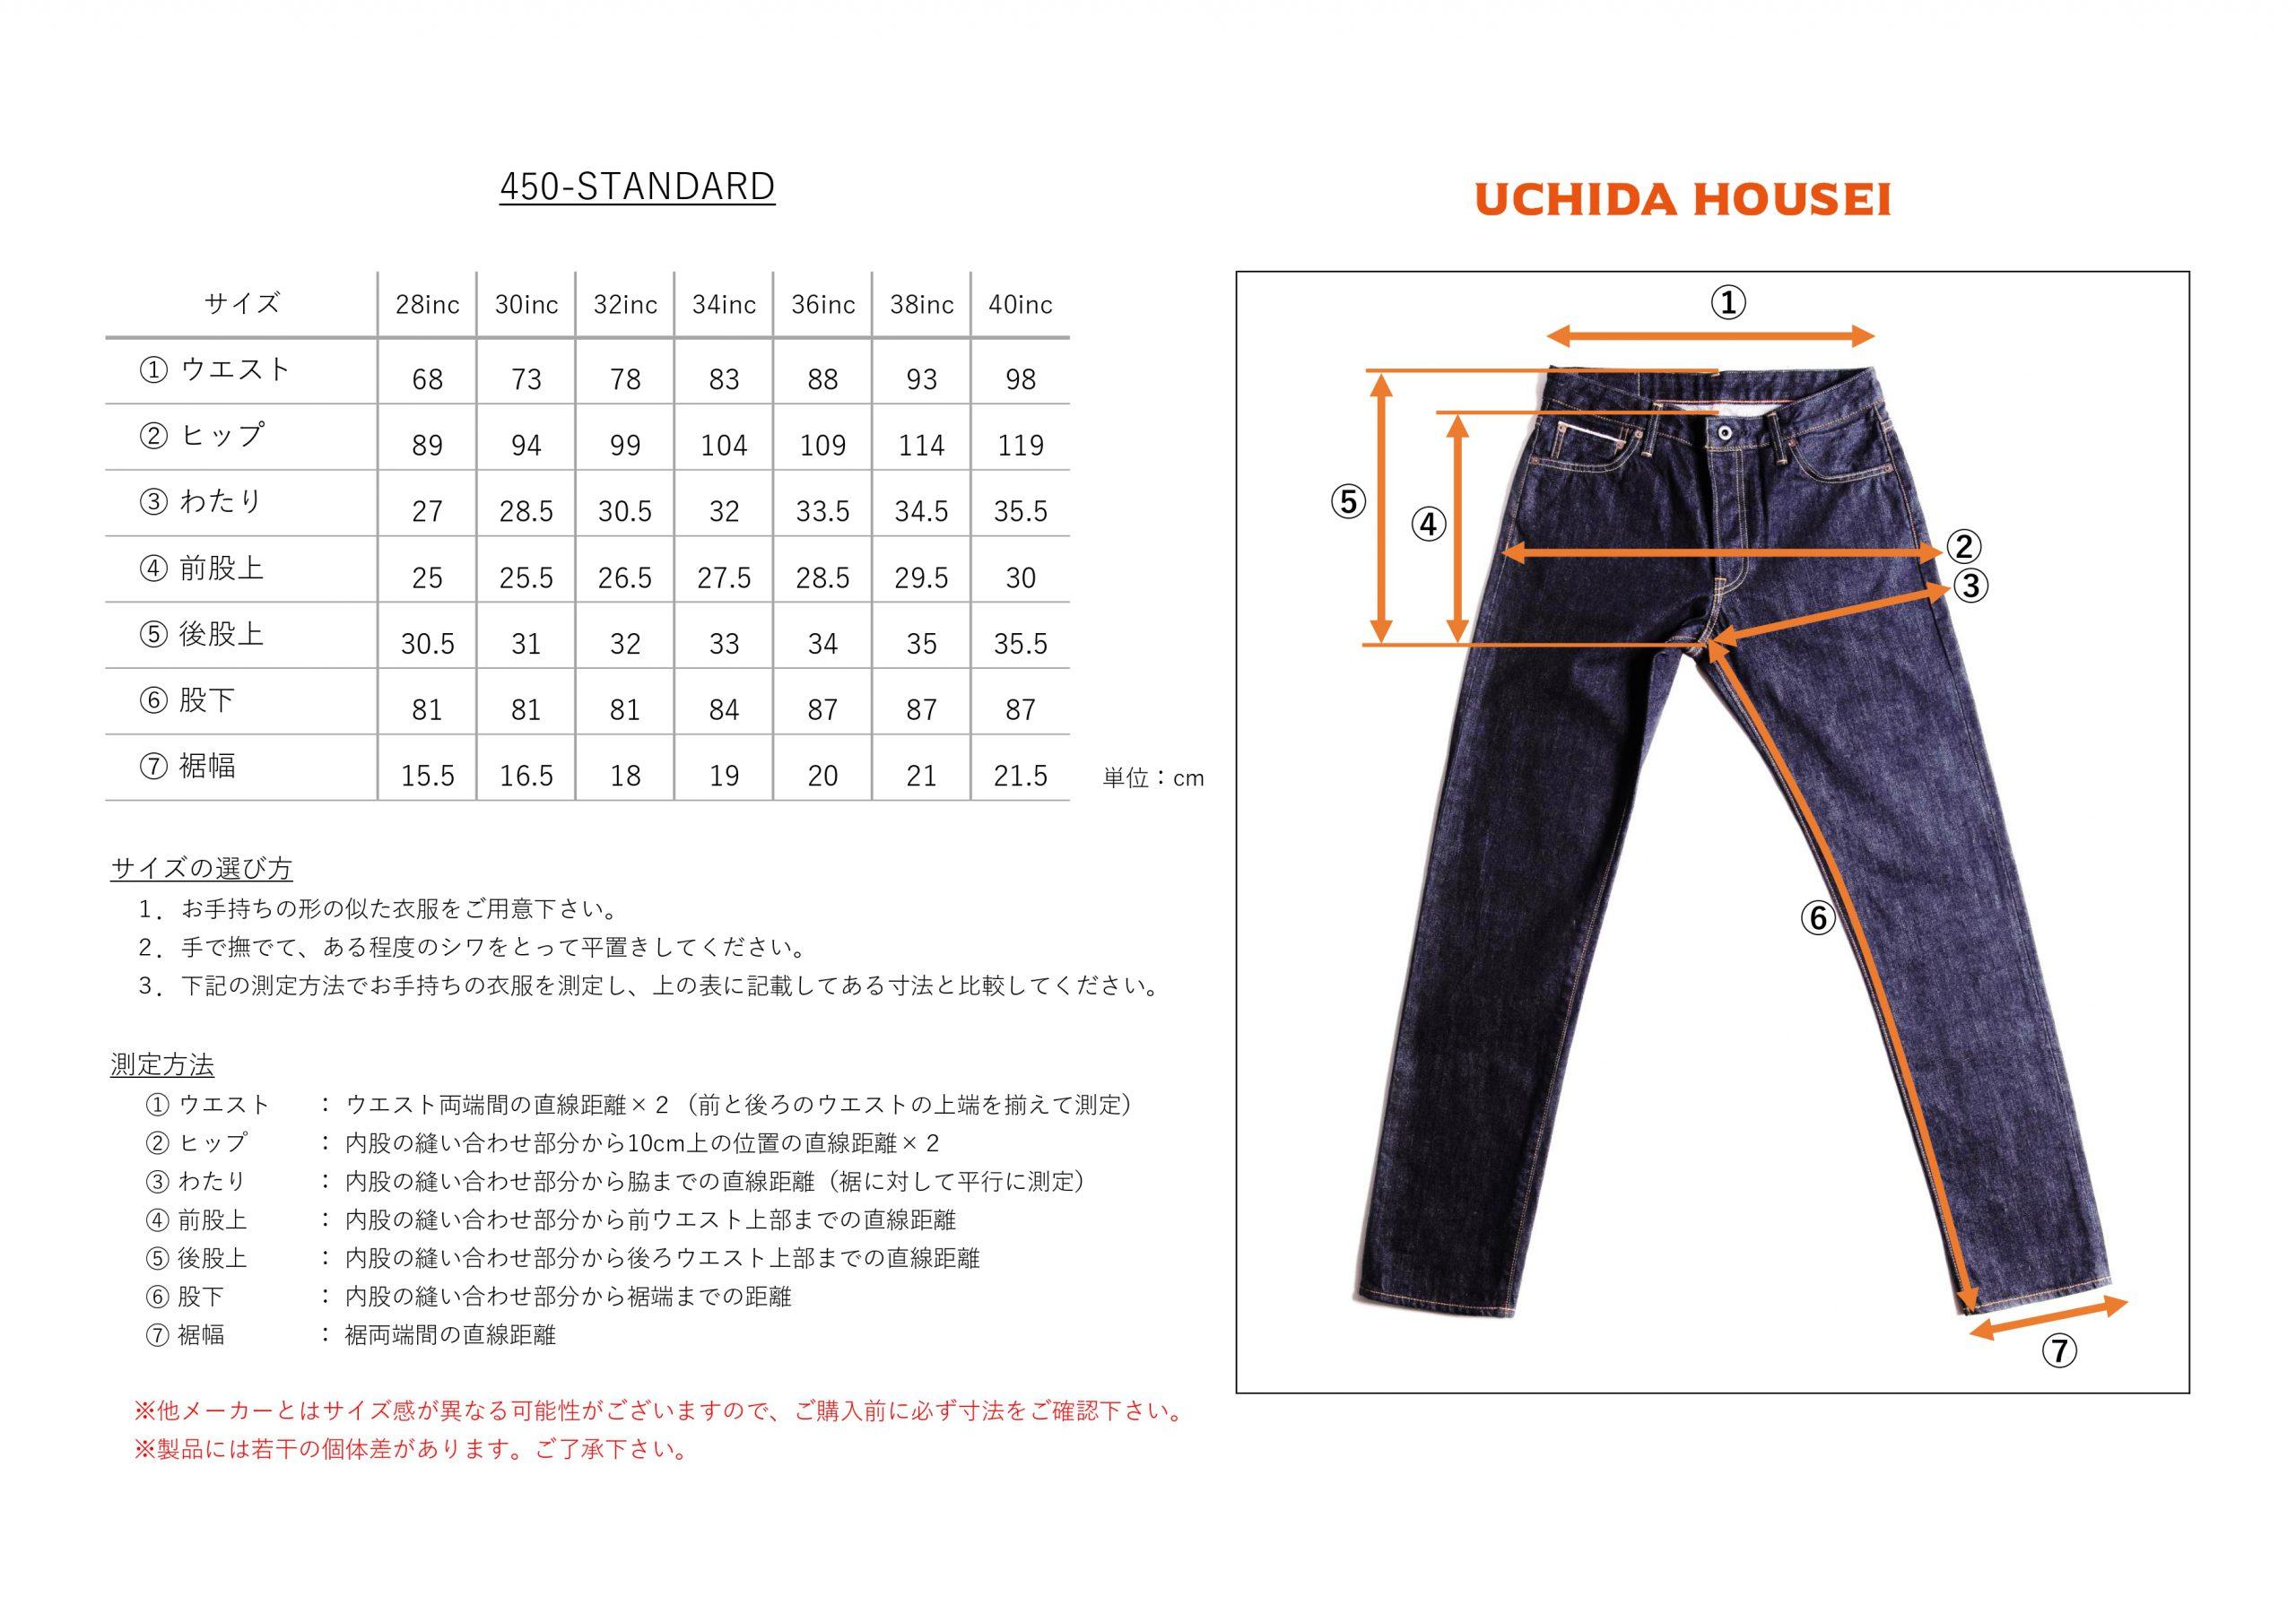 450-STANDARD【スタンダード】